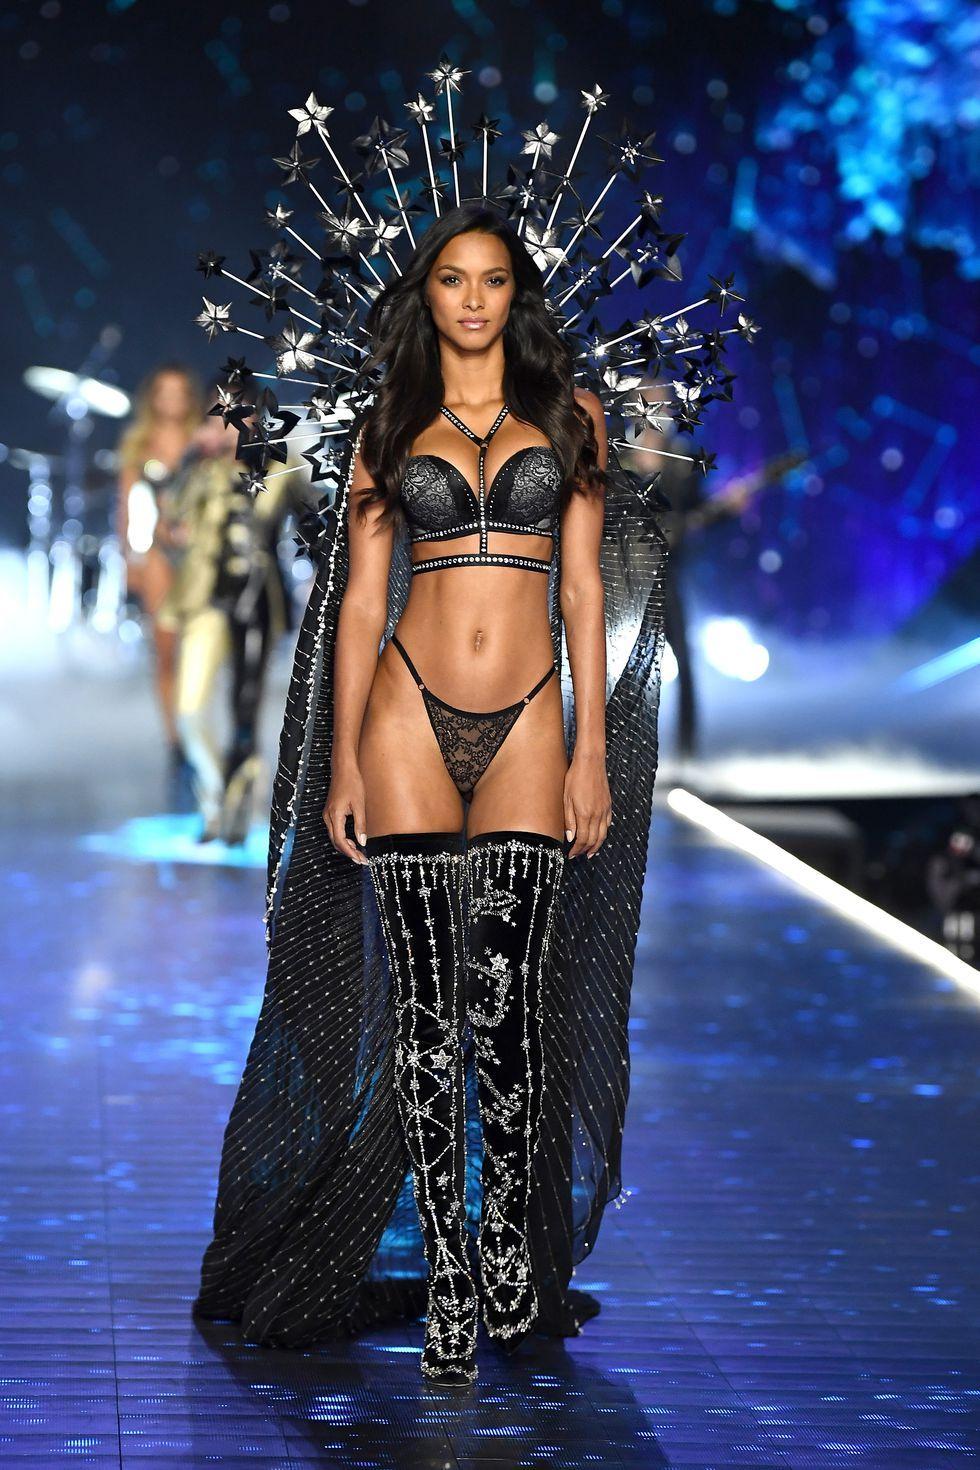 Vloet Secret Victoria 2016 Sanne